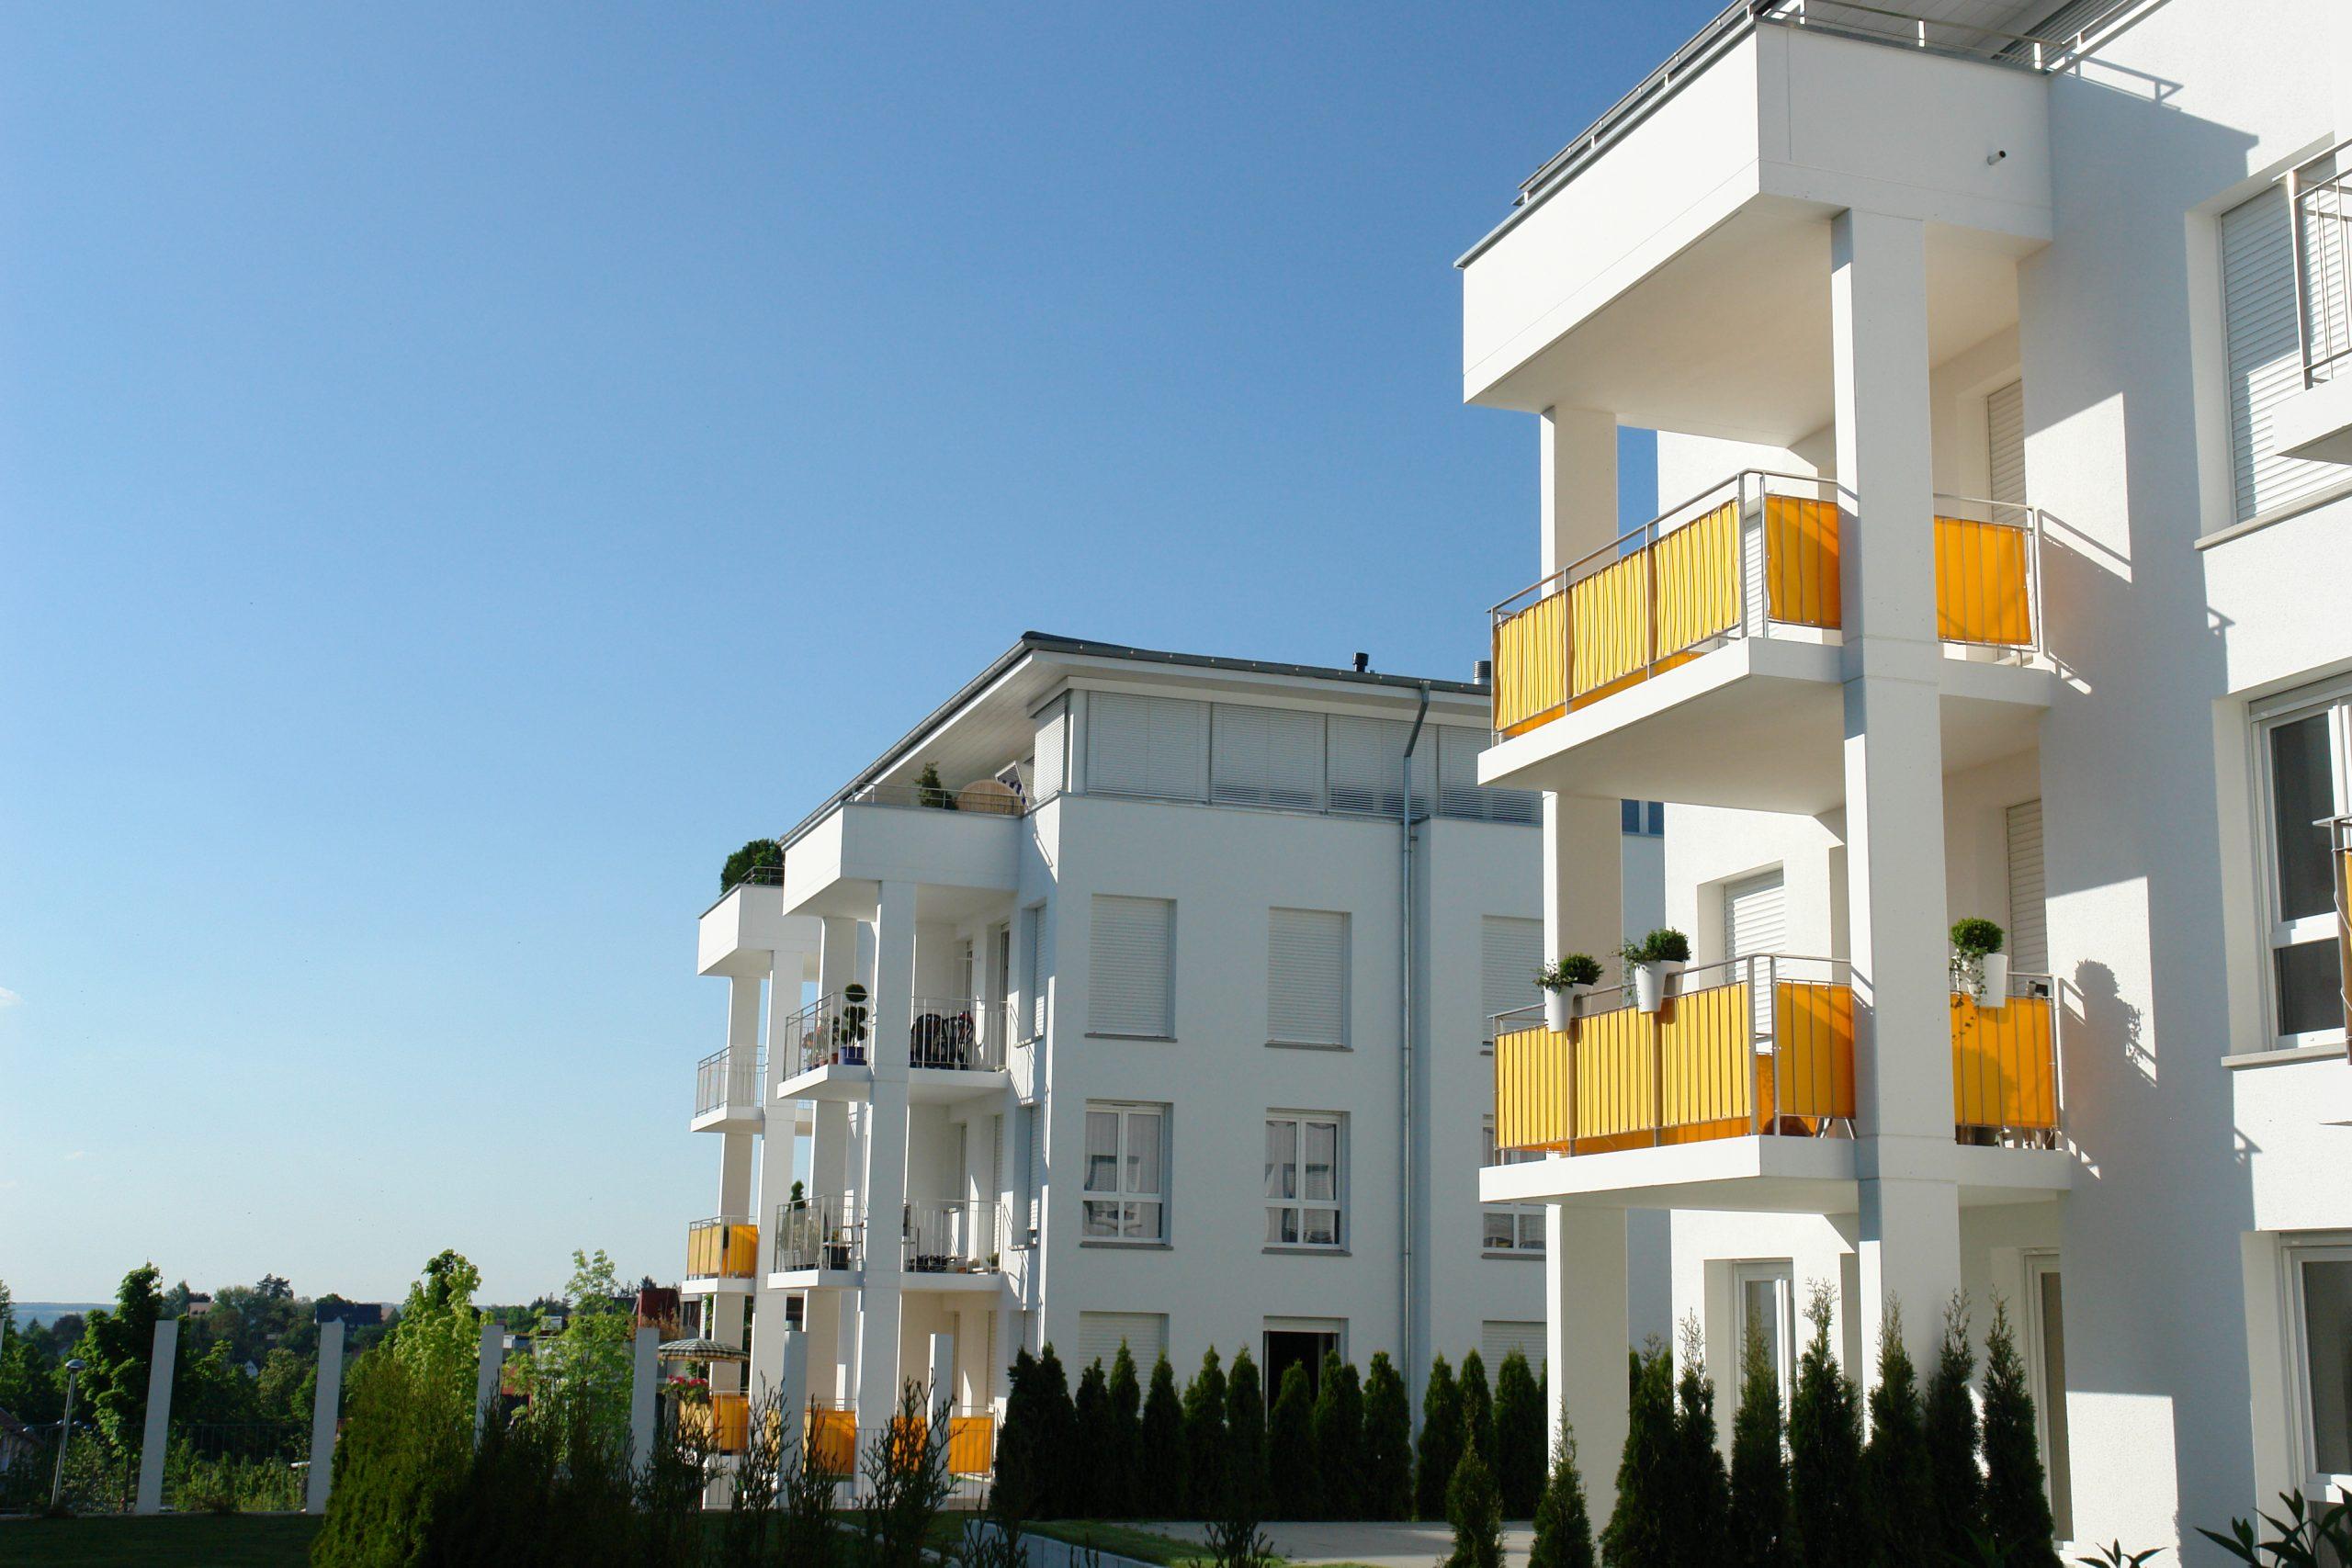 4-Zimmer-Penthousewohnung – Unterm Georgenberg 21, Reutlingen